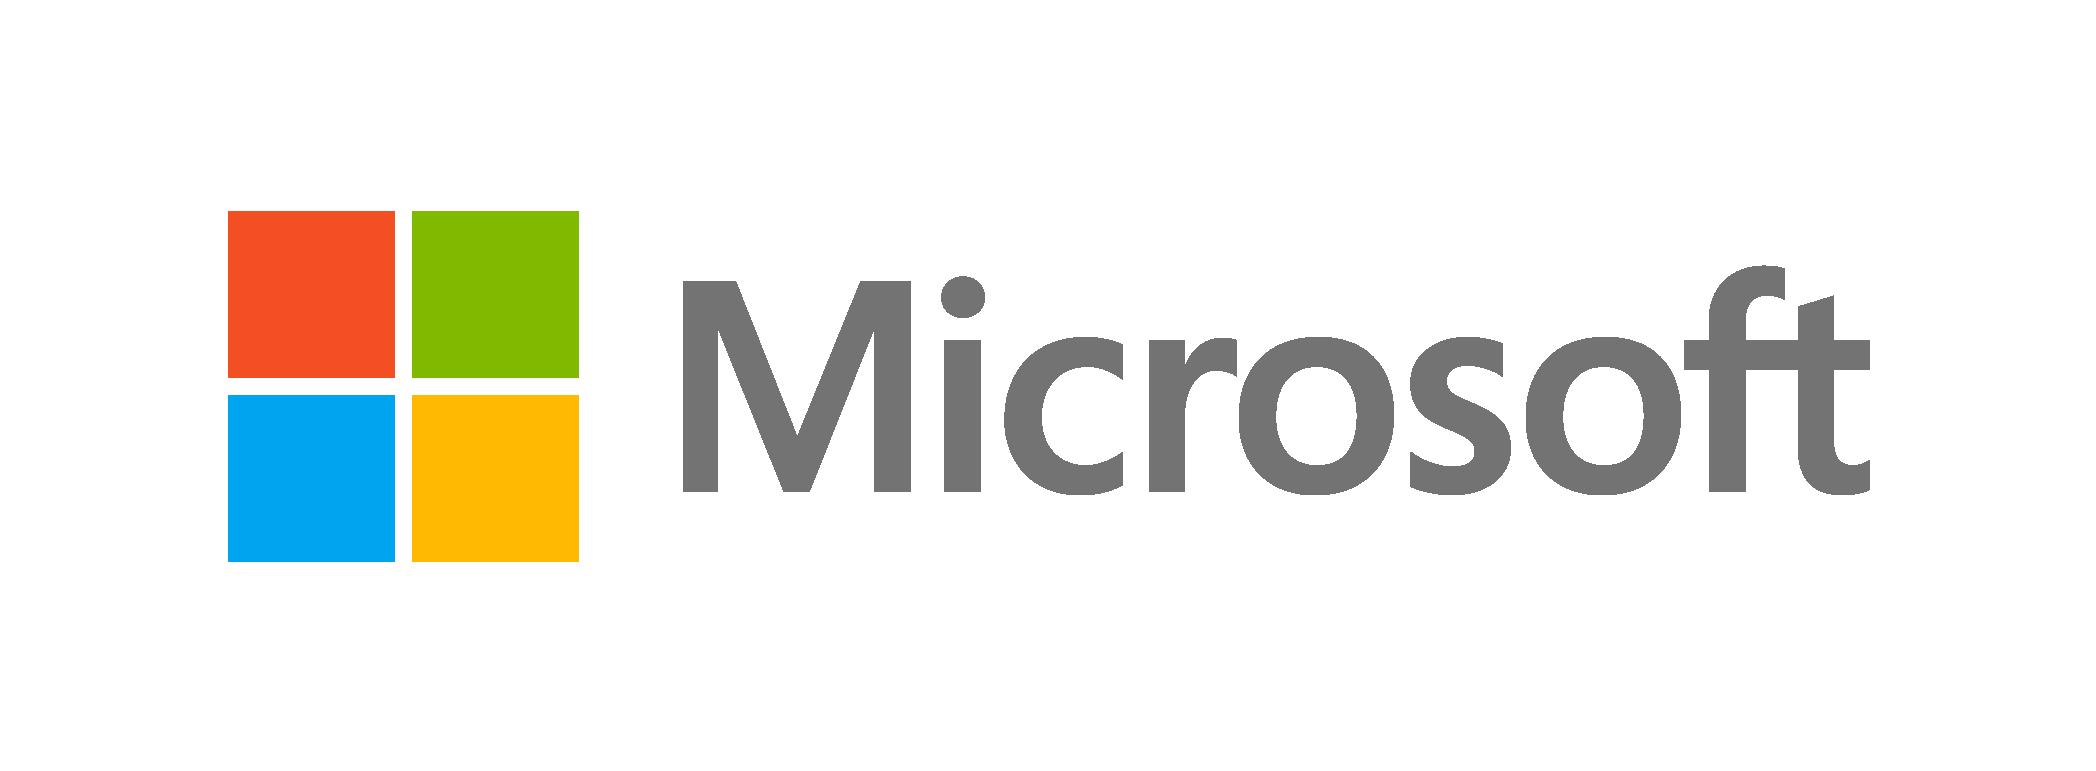 Microsoft BI logo